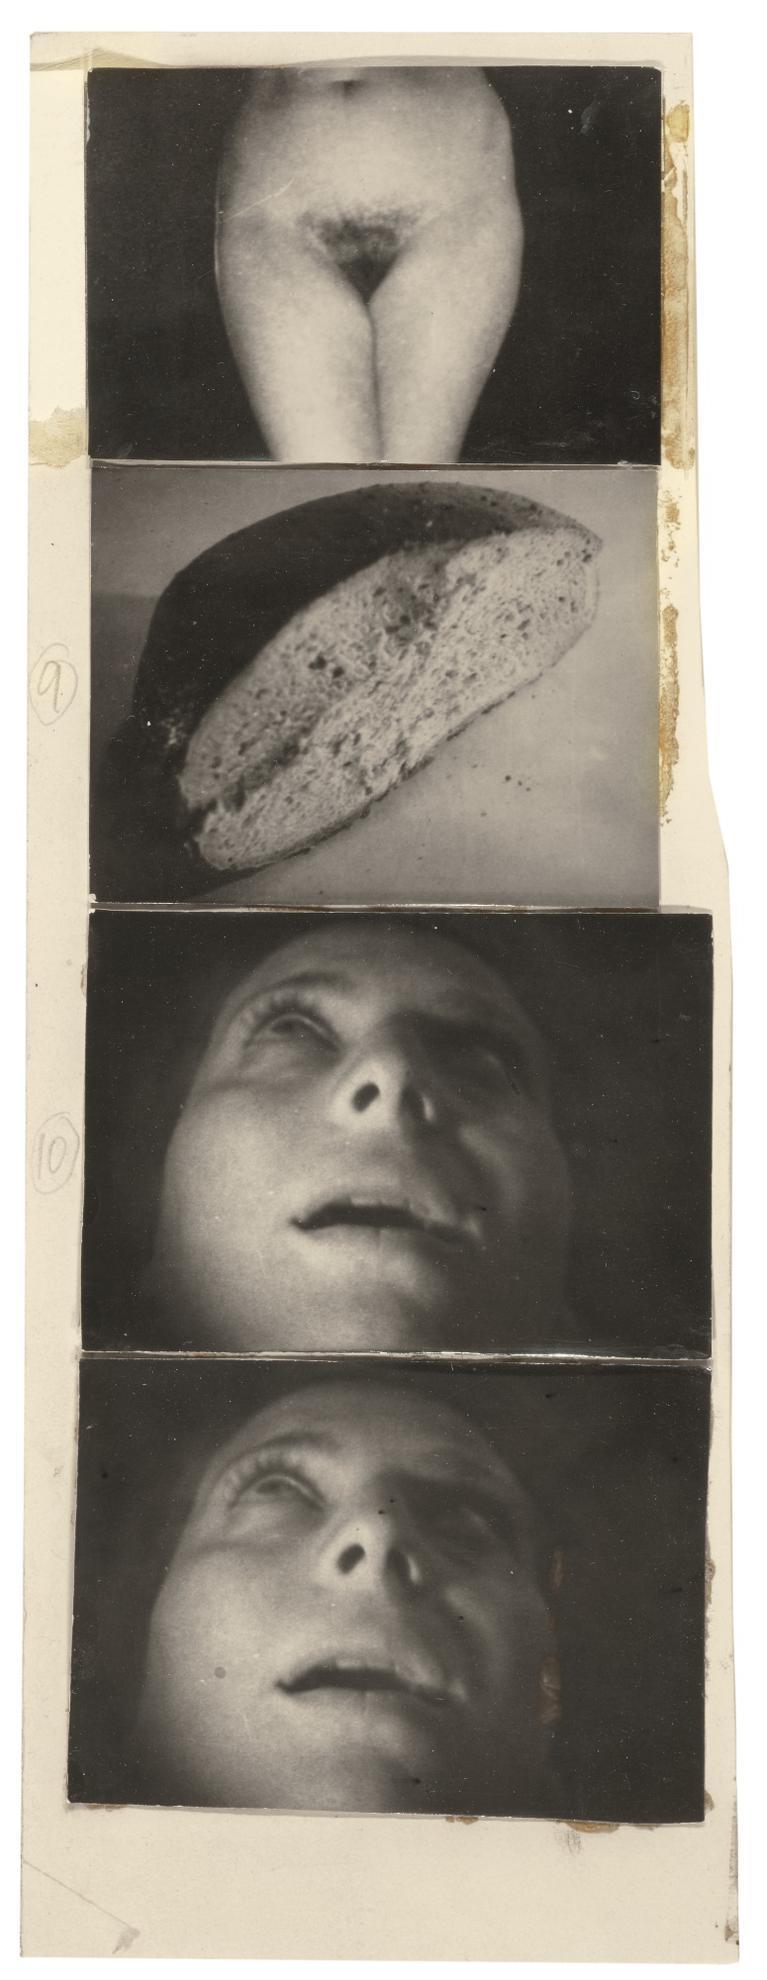 Stefan Themerson - Enlarged Film Stills From Europa-1932